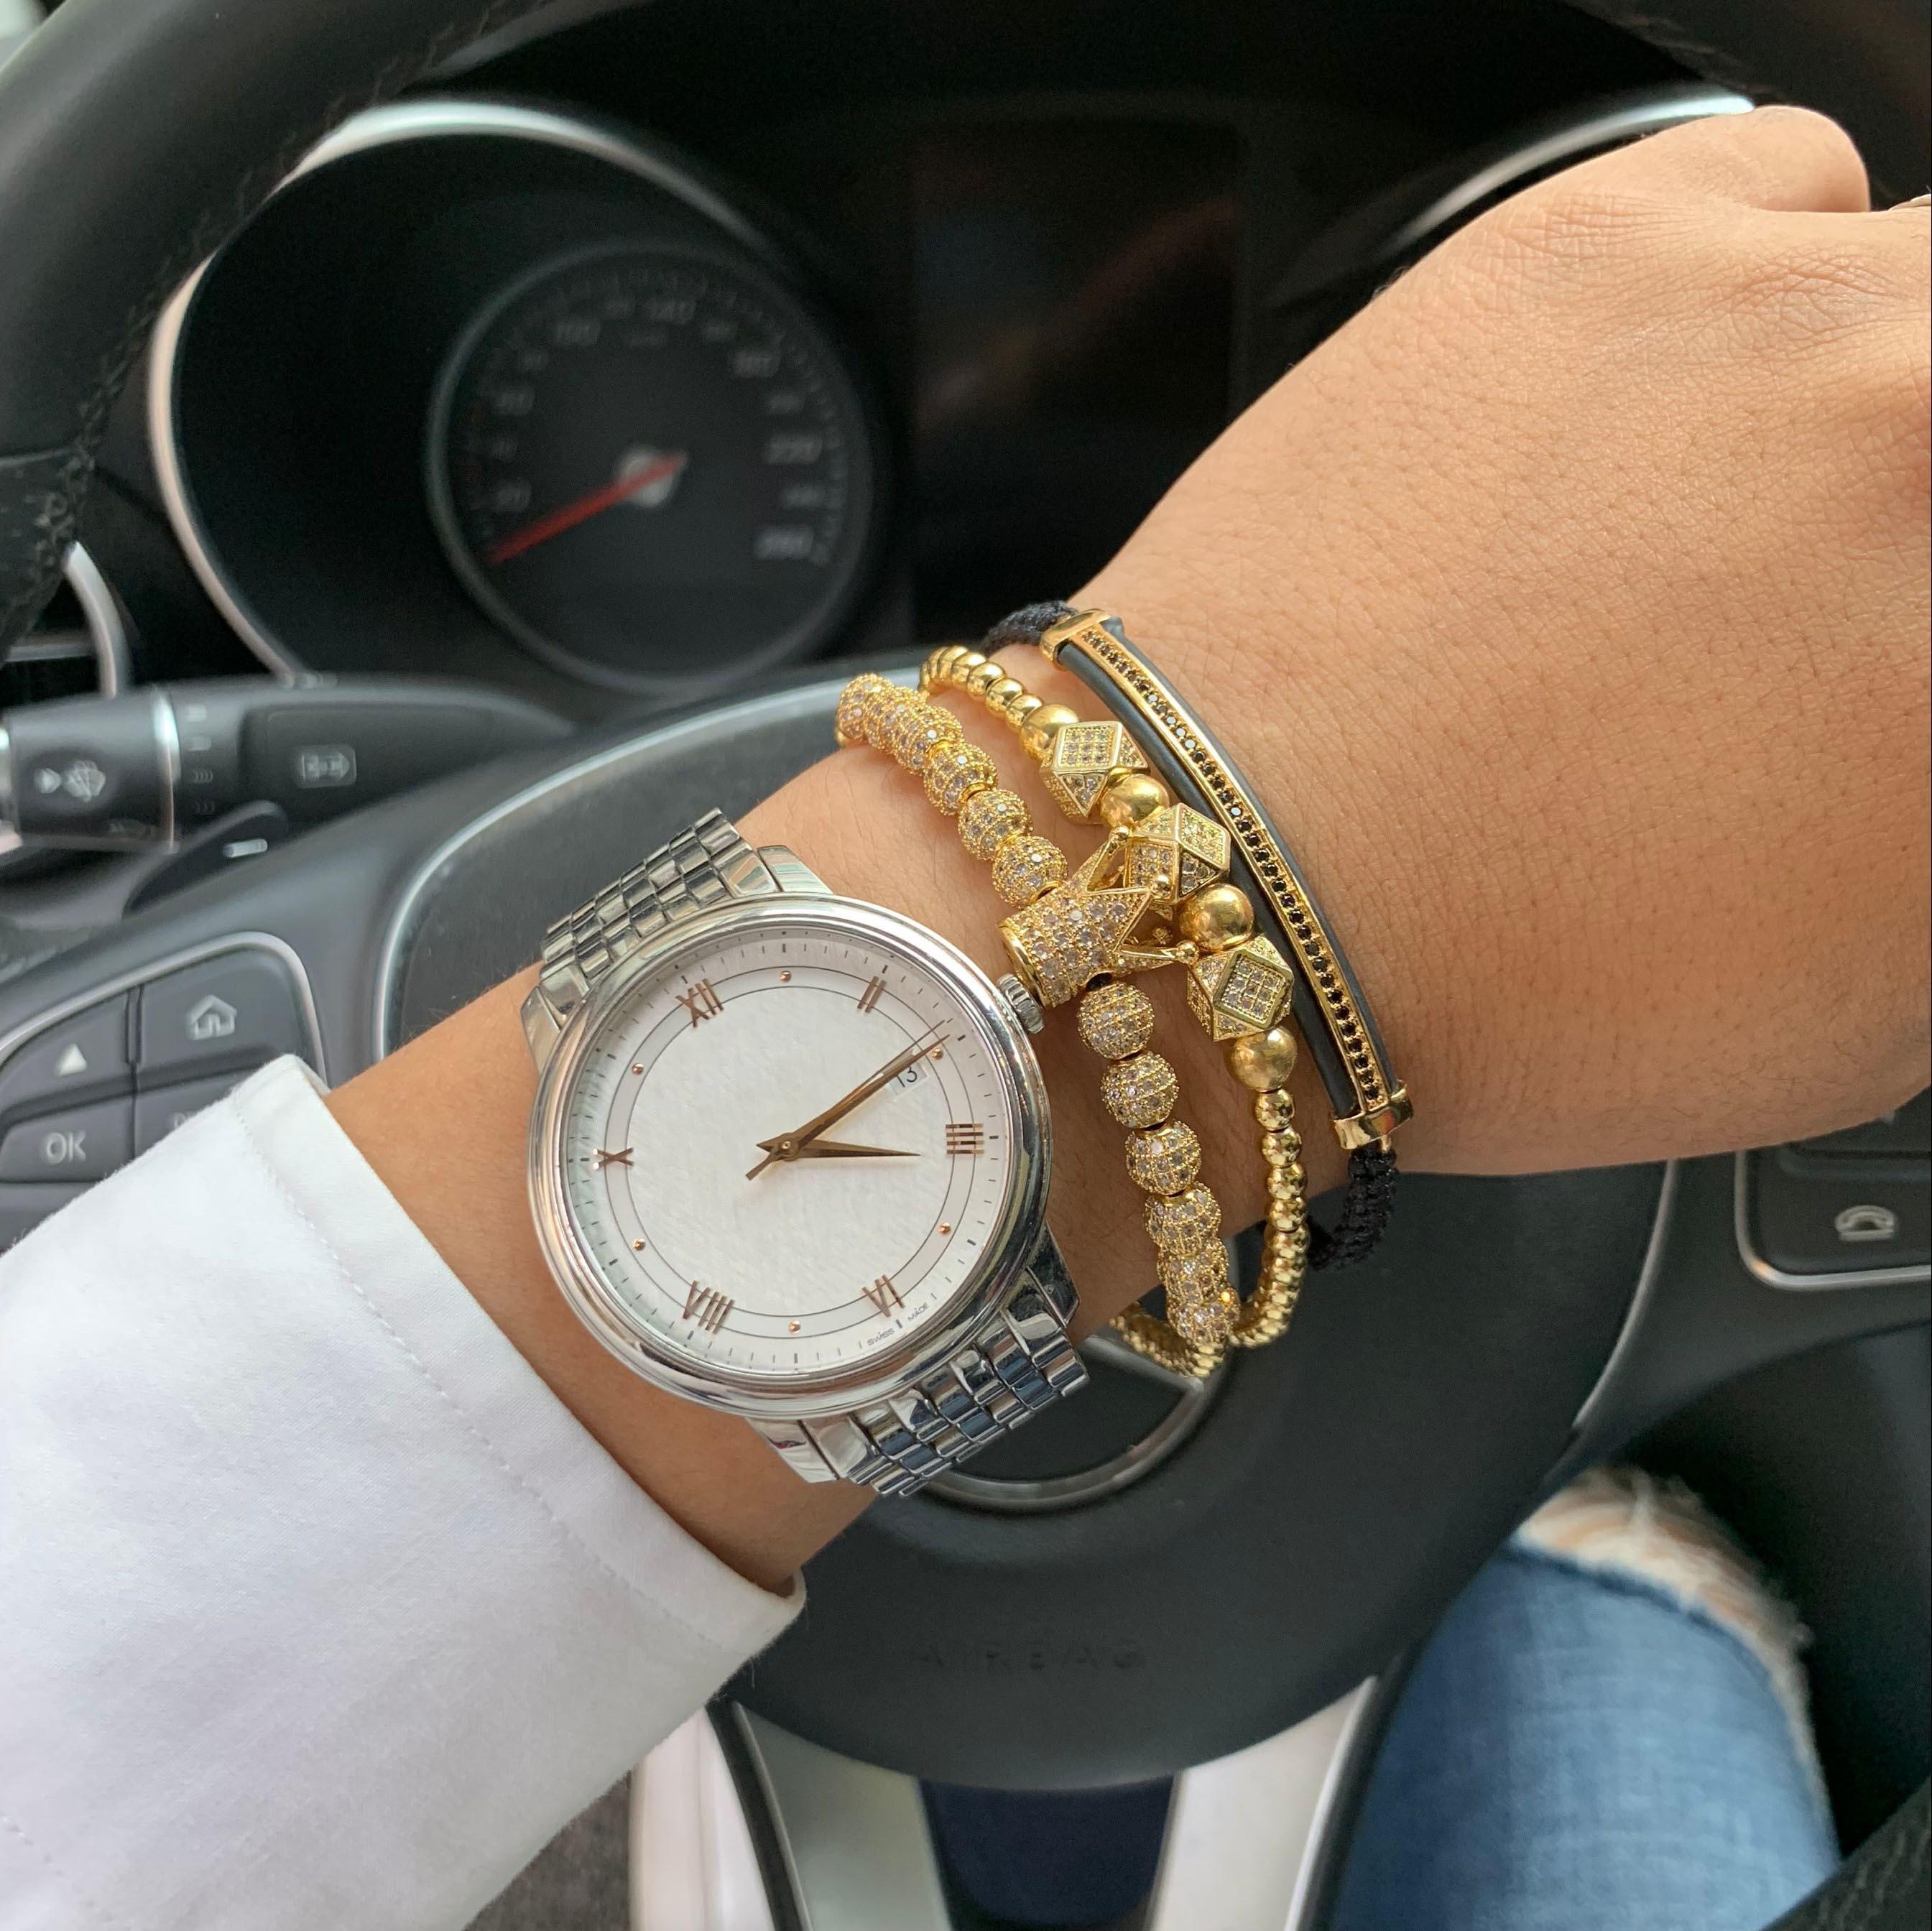 3 unids/set oro de lujo corona de circonia cúbica beads Charm bracelet stacks hecho a mano macramé hombres pulseras y brazaletes para hombres accesorios de joyería